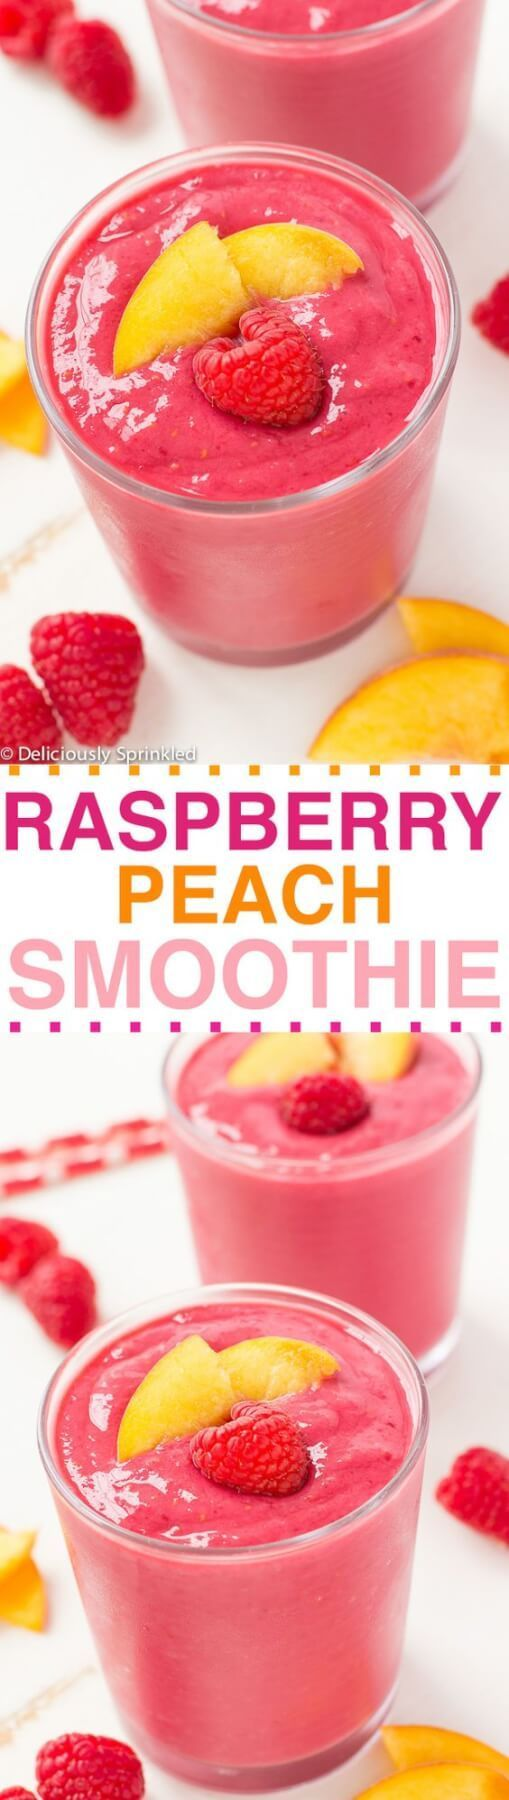 Raspberry Peach Smoothie Recipe Easy Smoothie Recipes